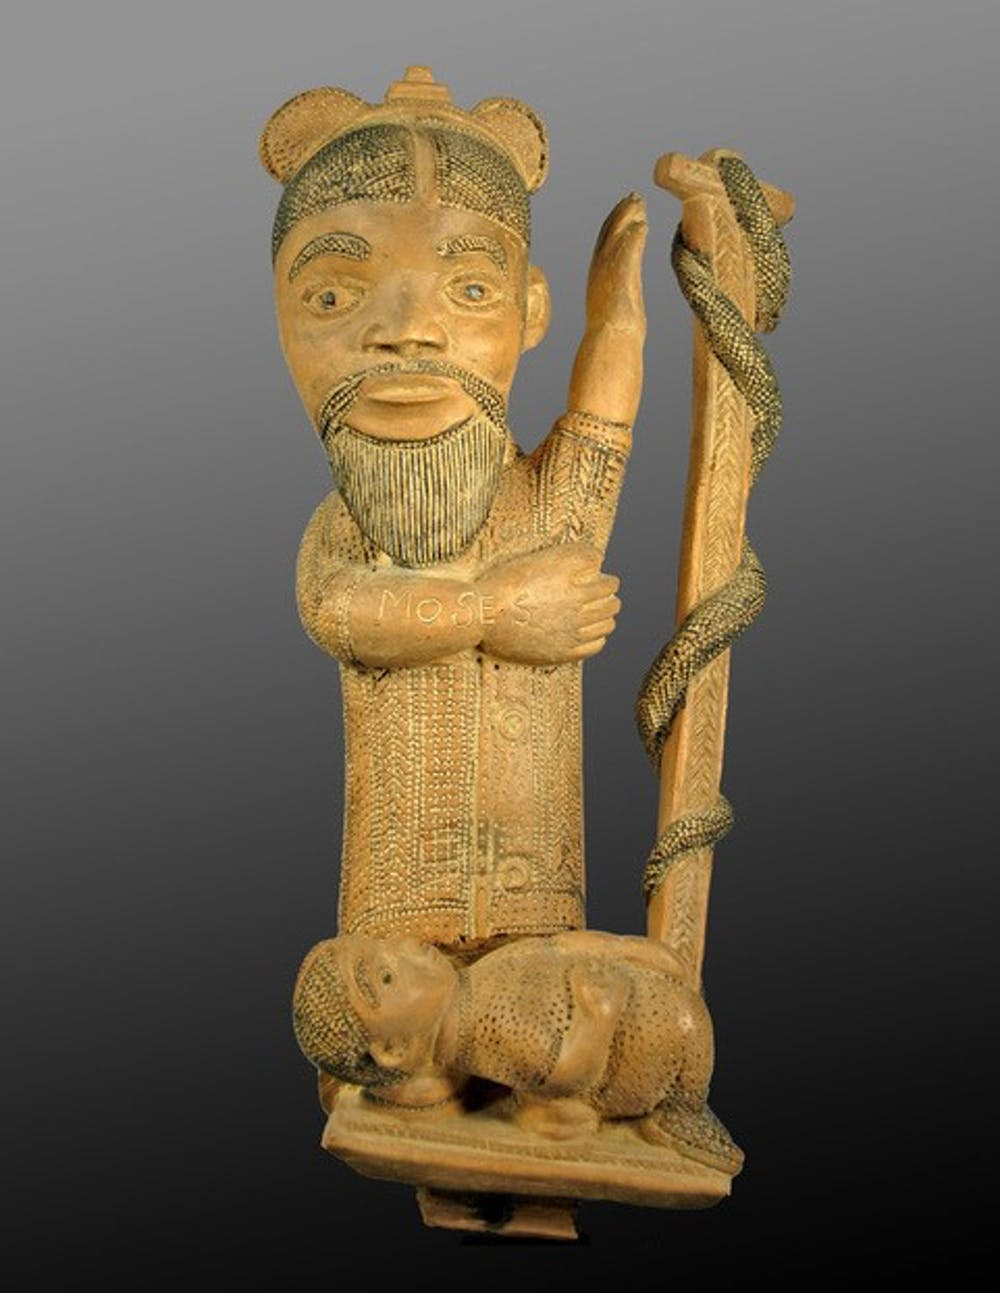 Ackland dispels assumed myths through African sculptures exhibit